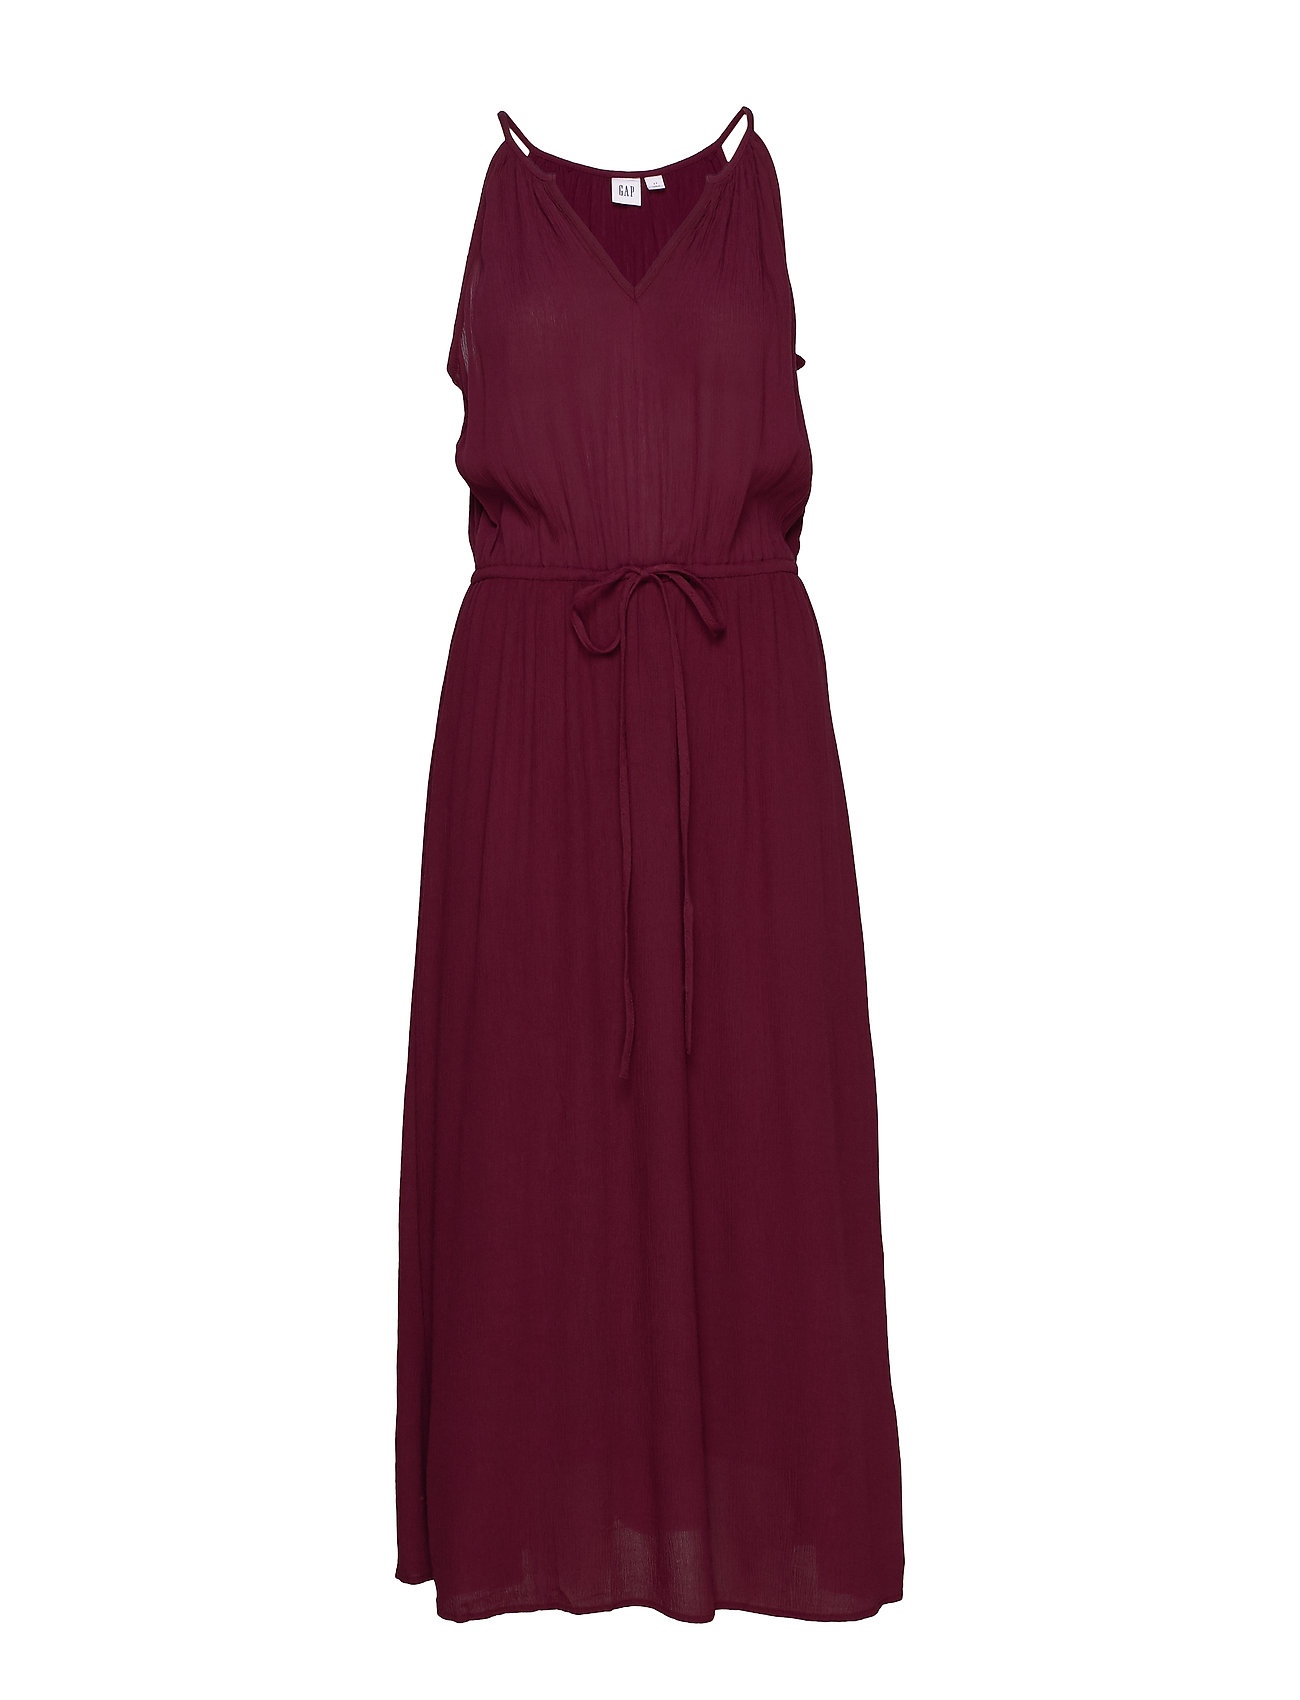 GAP Crinkle Halter Midi Dress - RUBY WINE